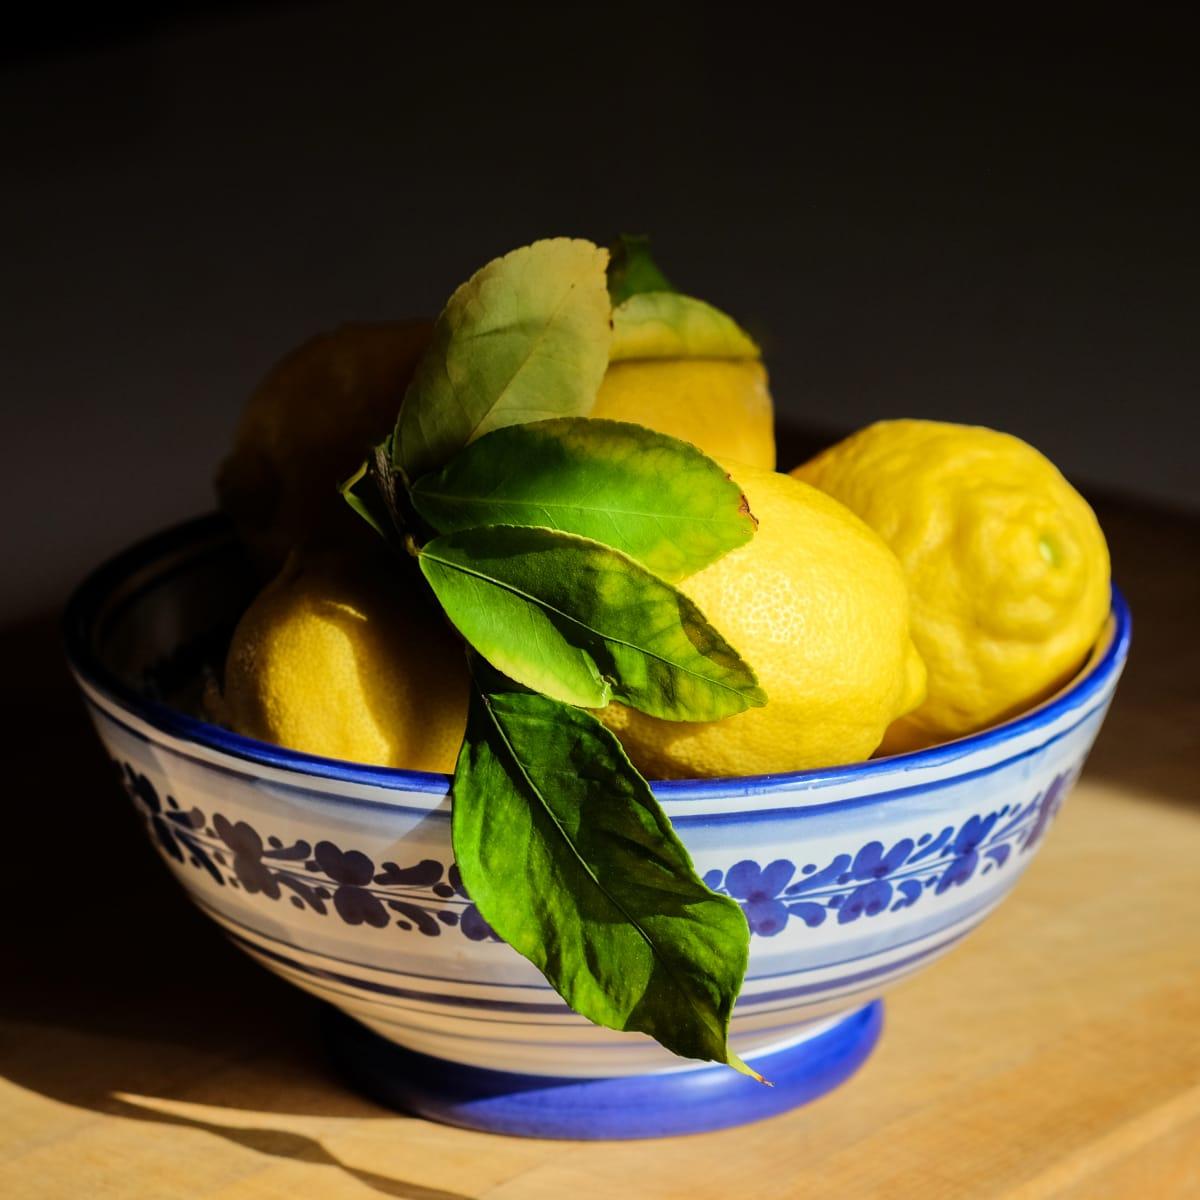 Backyard Lemons by Kelly Sinclair